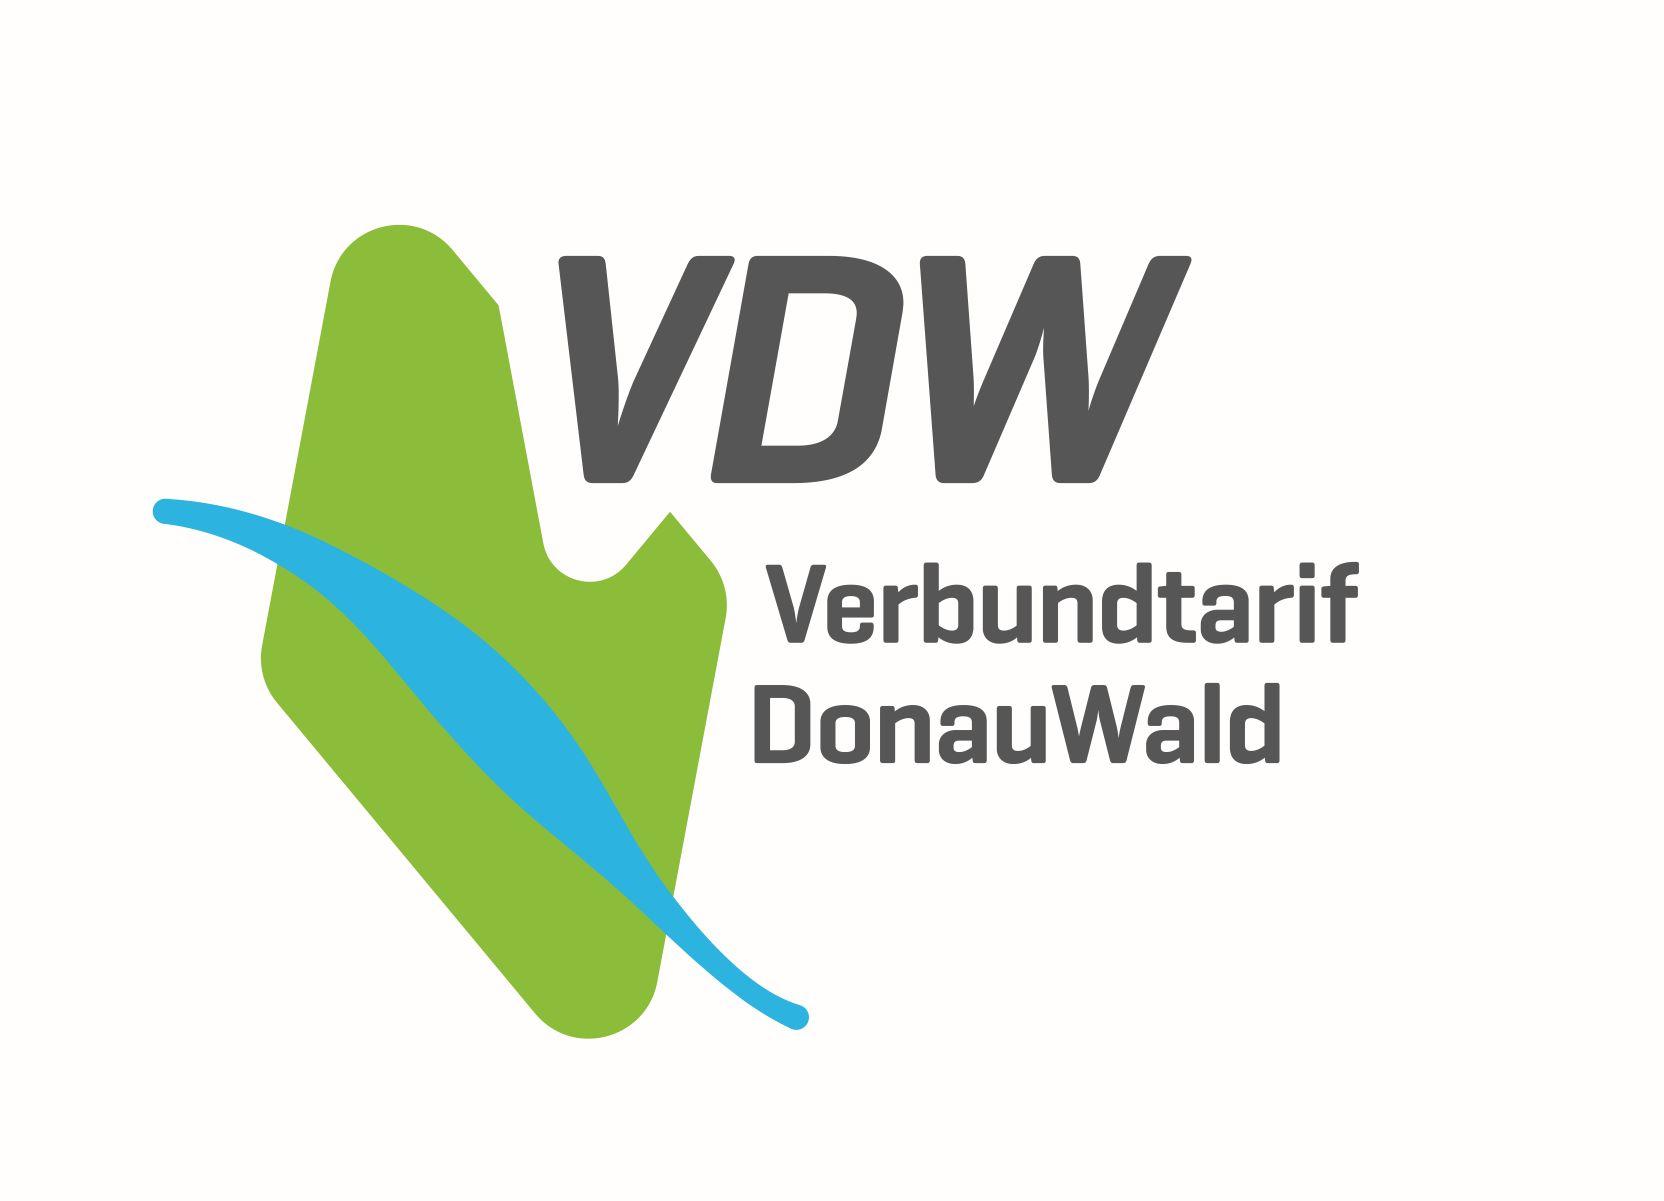 Log des Verbundtarif Doanu Wald in jpg